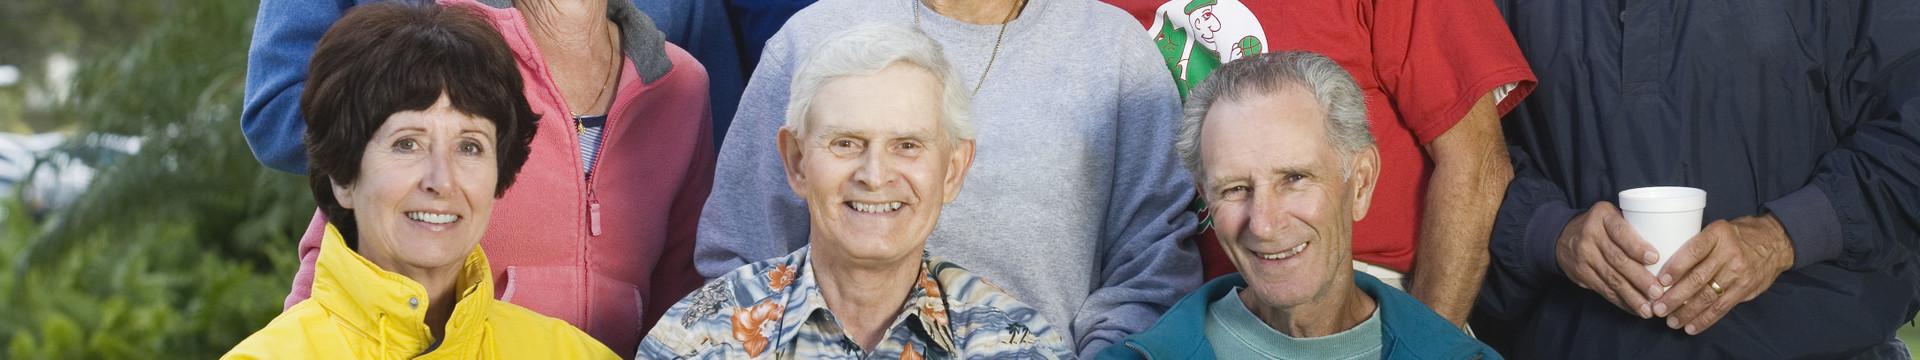 Senior Travel Rates In Branson Missouri - Group of senior citizens